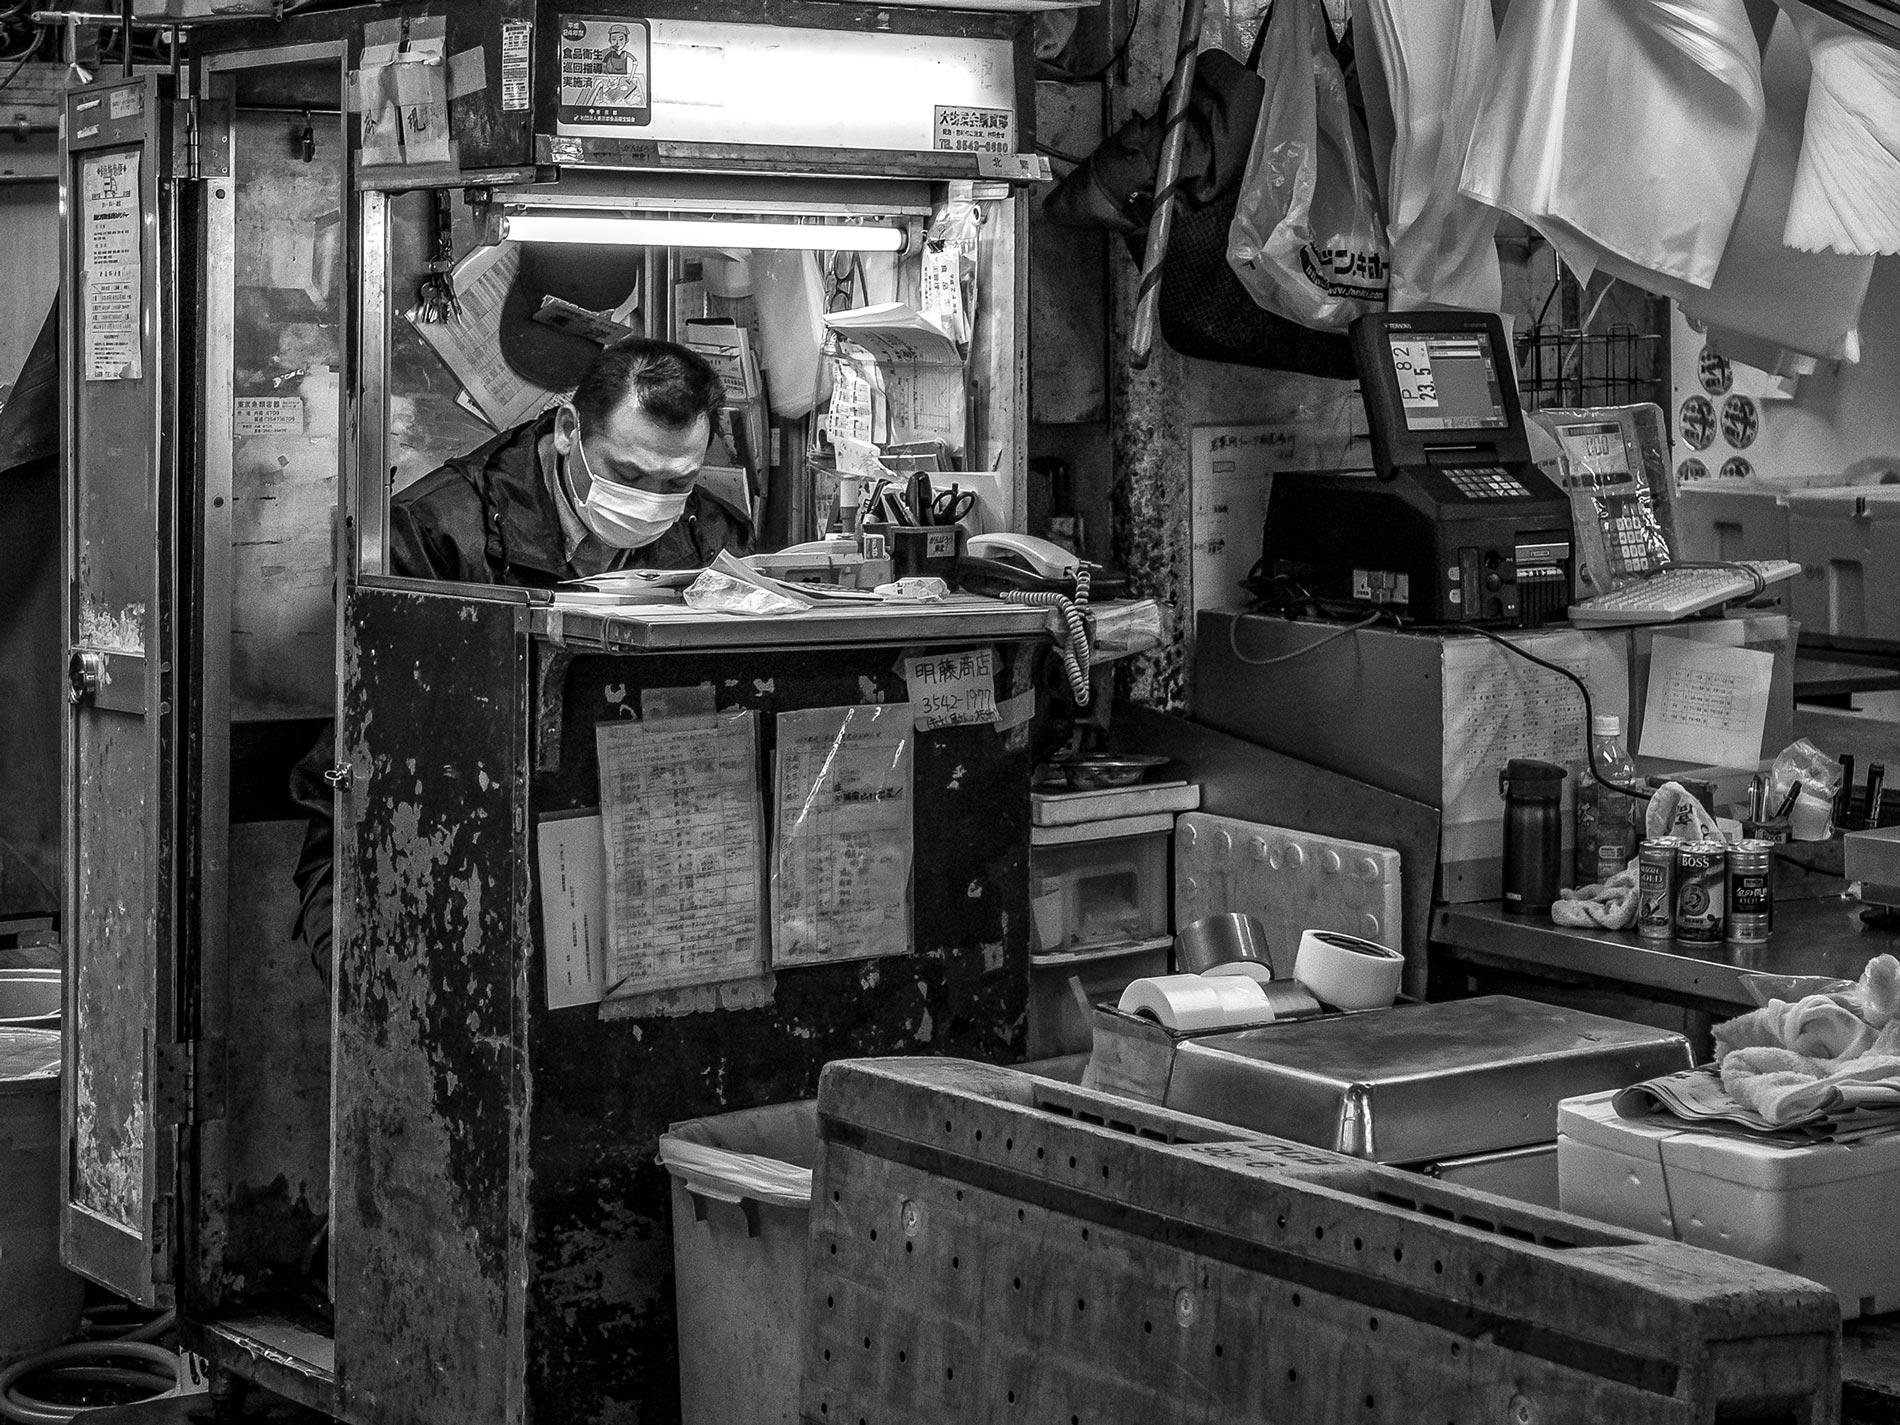 Book keeper - Tsukiji fish market, Tokyo